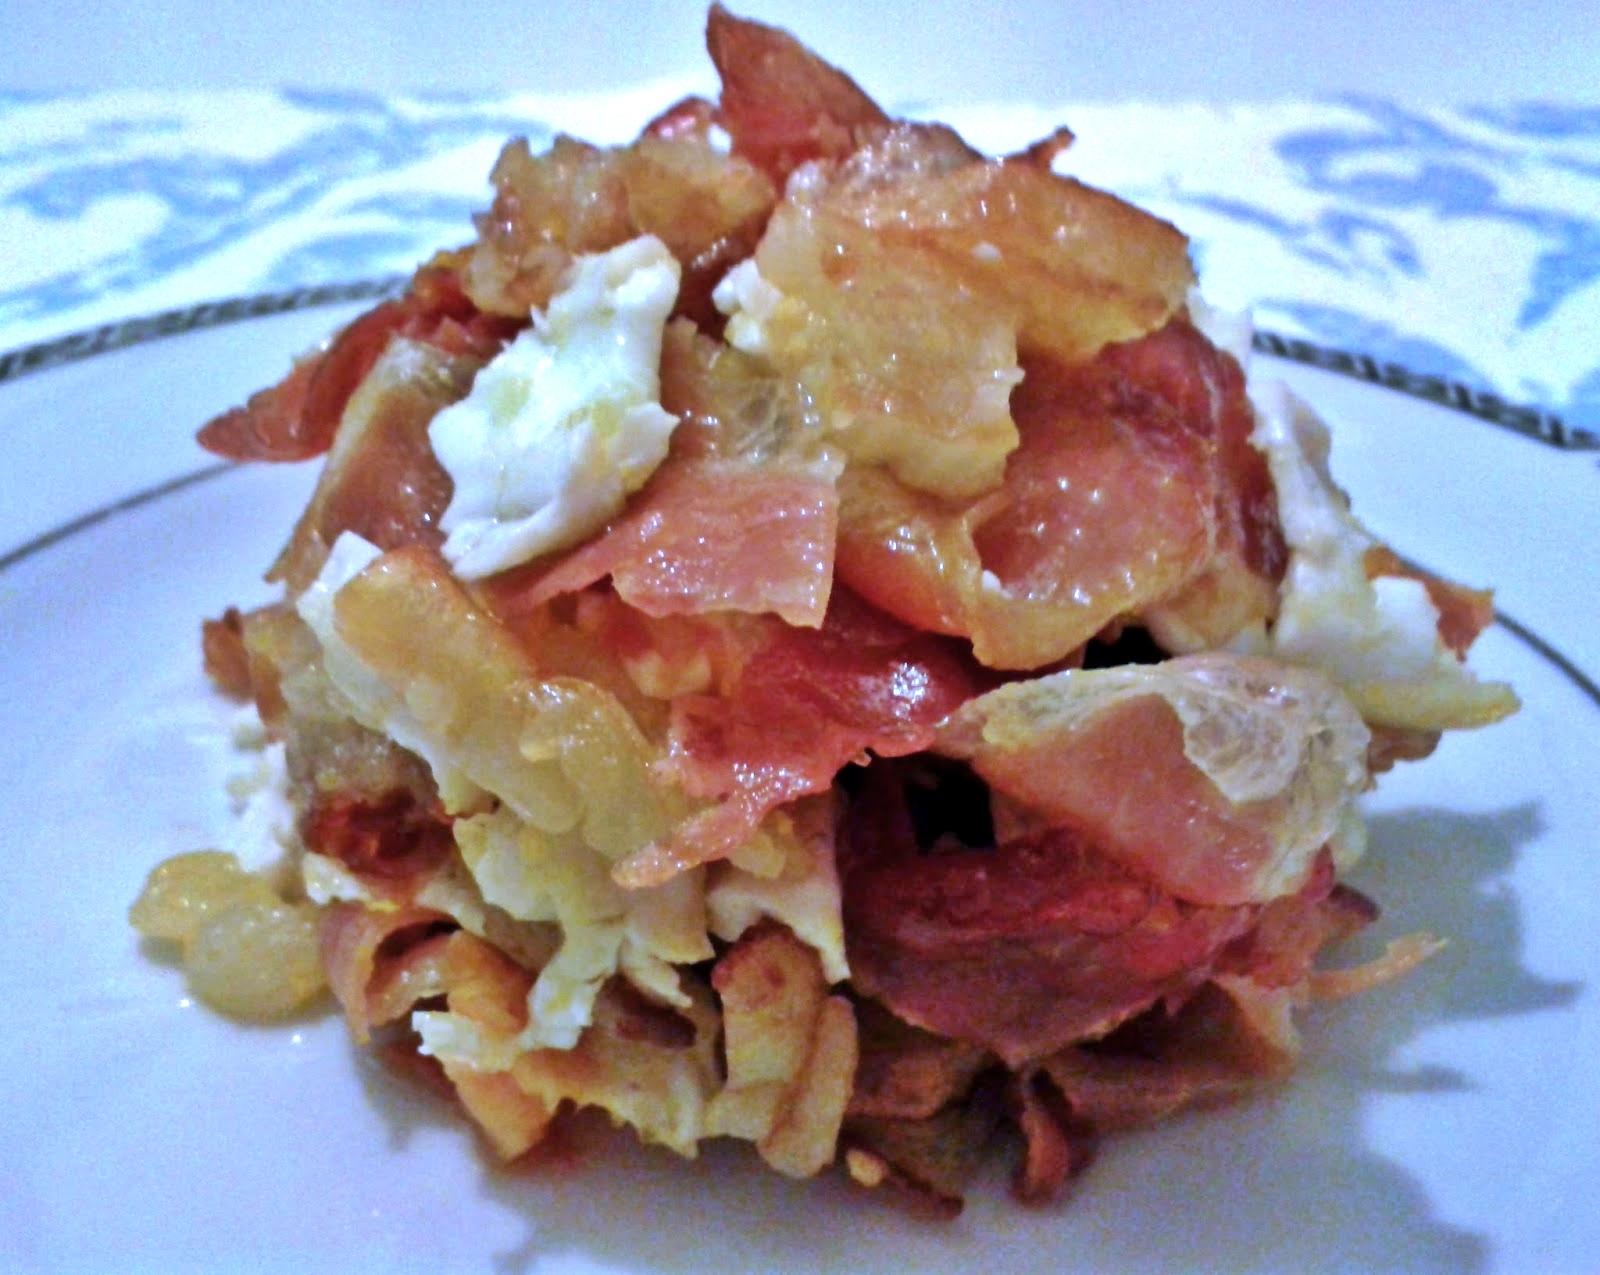 Lคs Ŗєcєтinคs Ðє kคr Gคrcíค..: Huevos rotos con jamón serrano y patatas